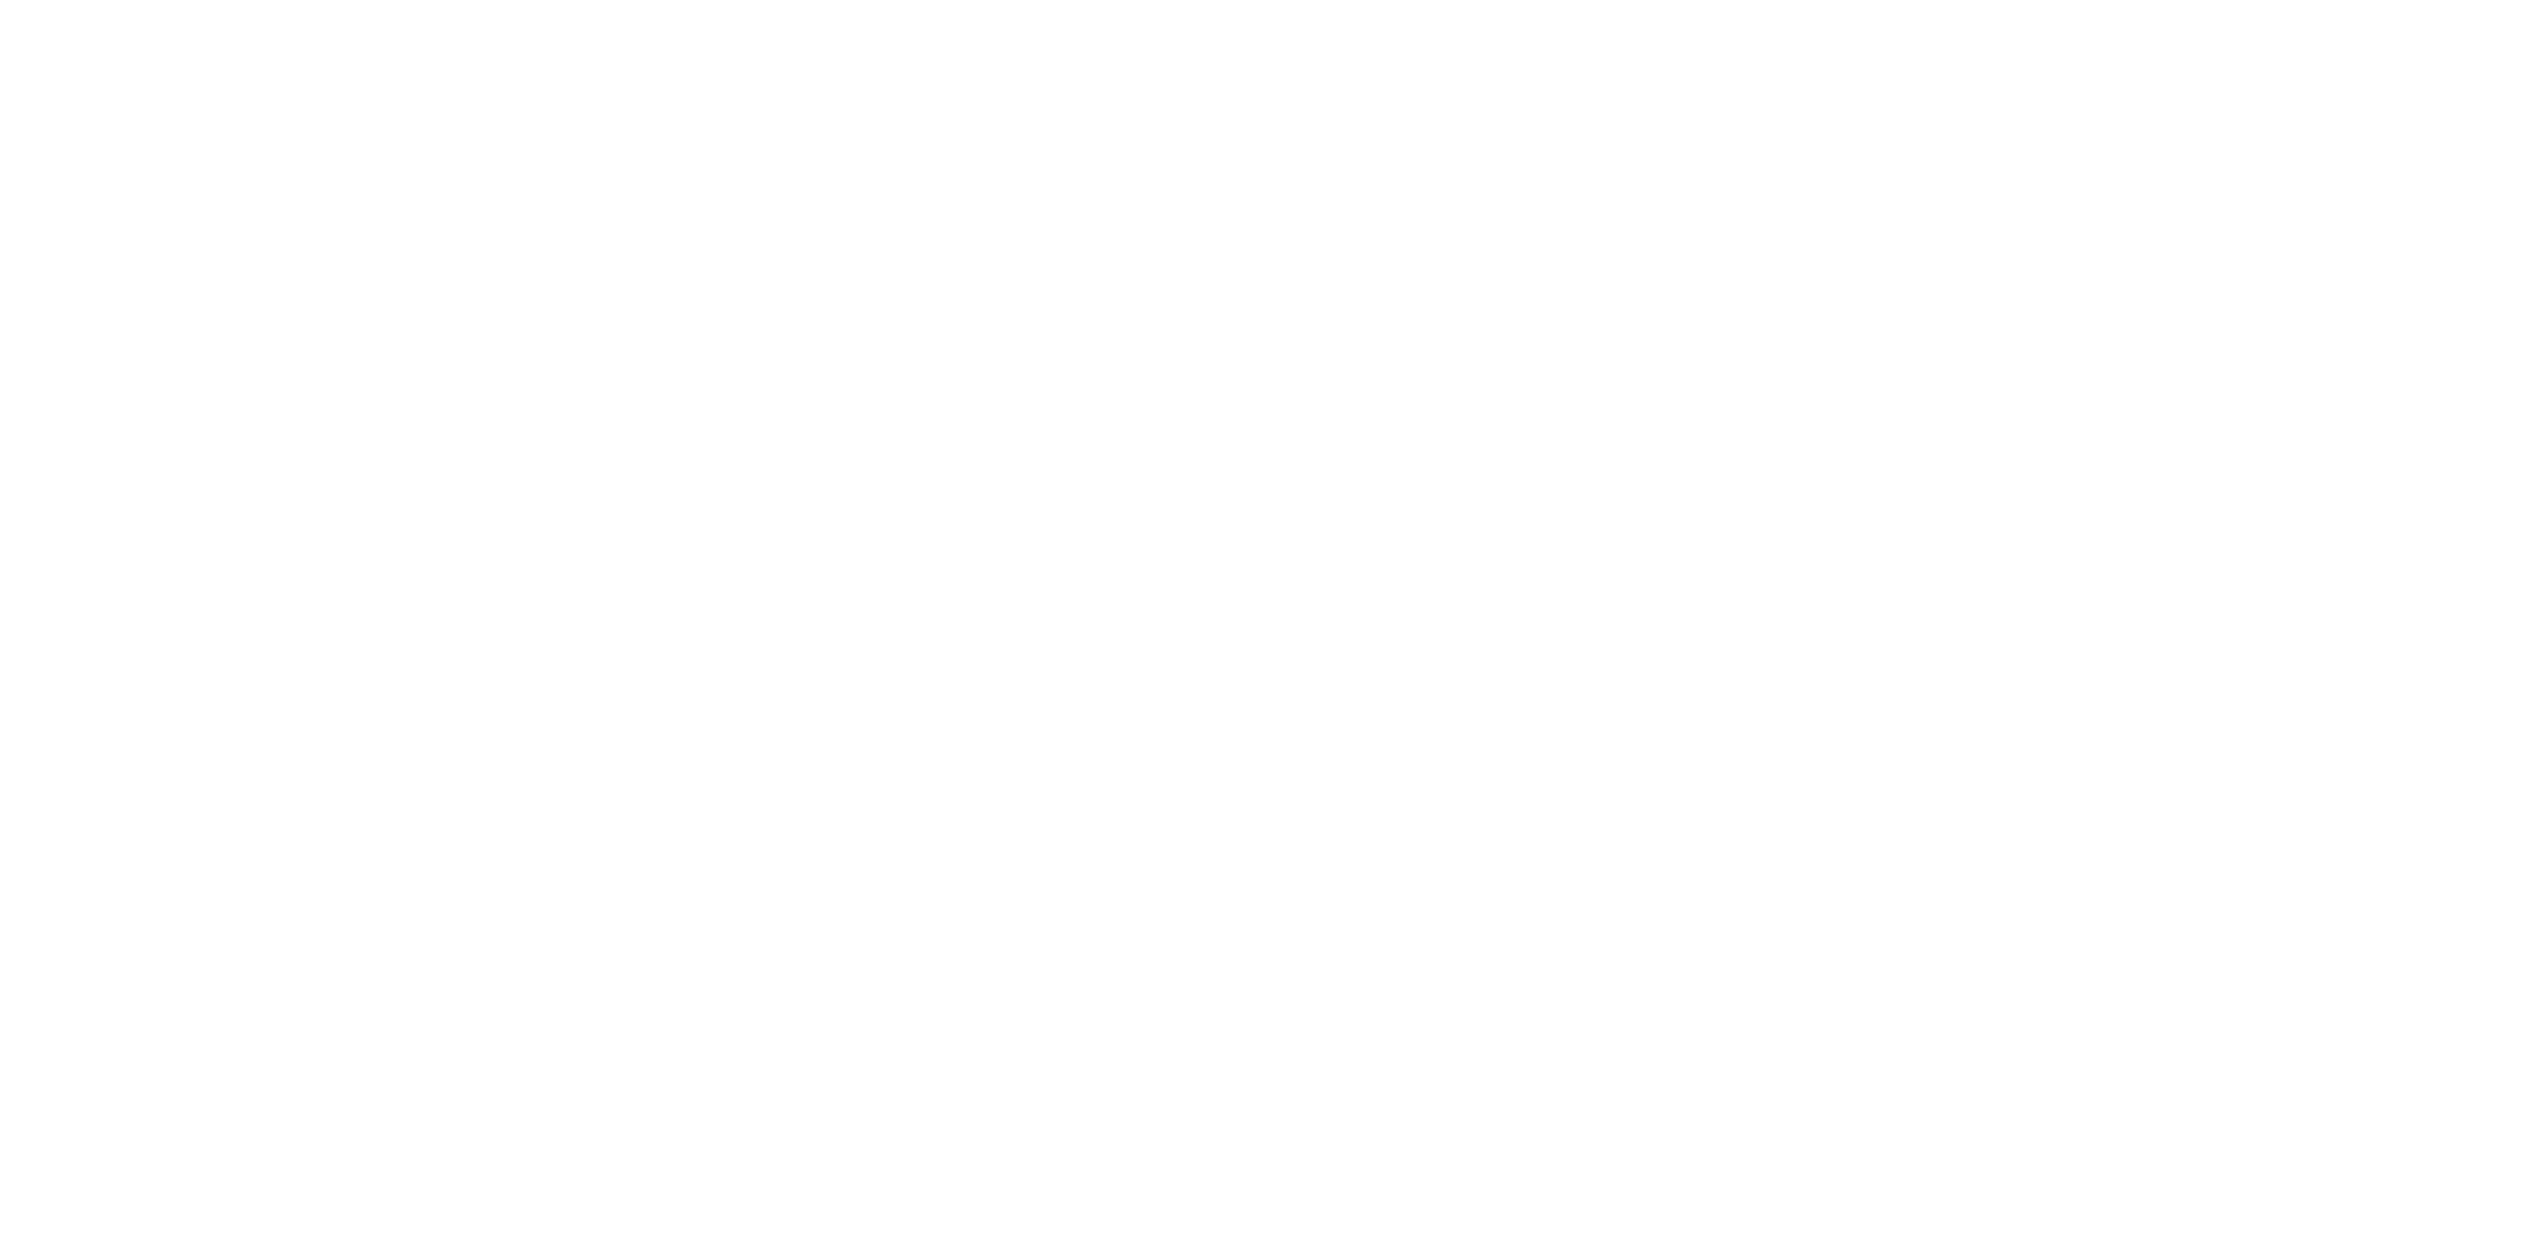 http://congresogro.gob.mx/62/inicio/wp-content/uploads/2021/02/logolxii.png